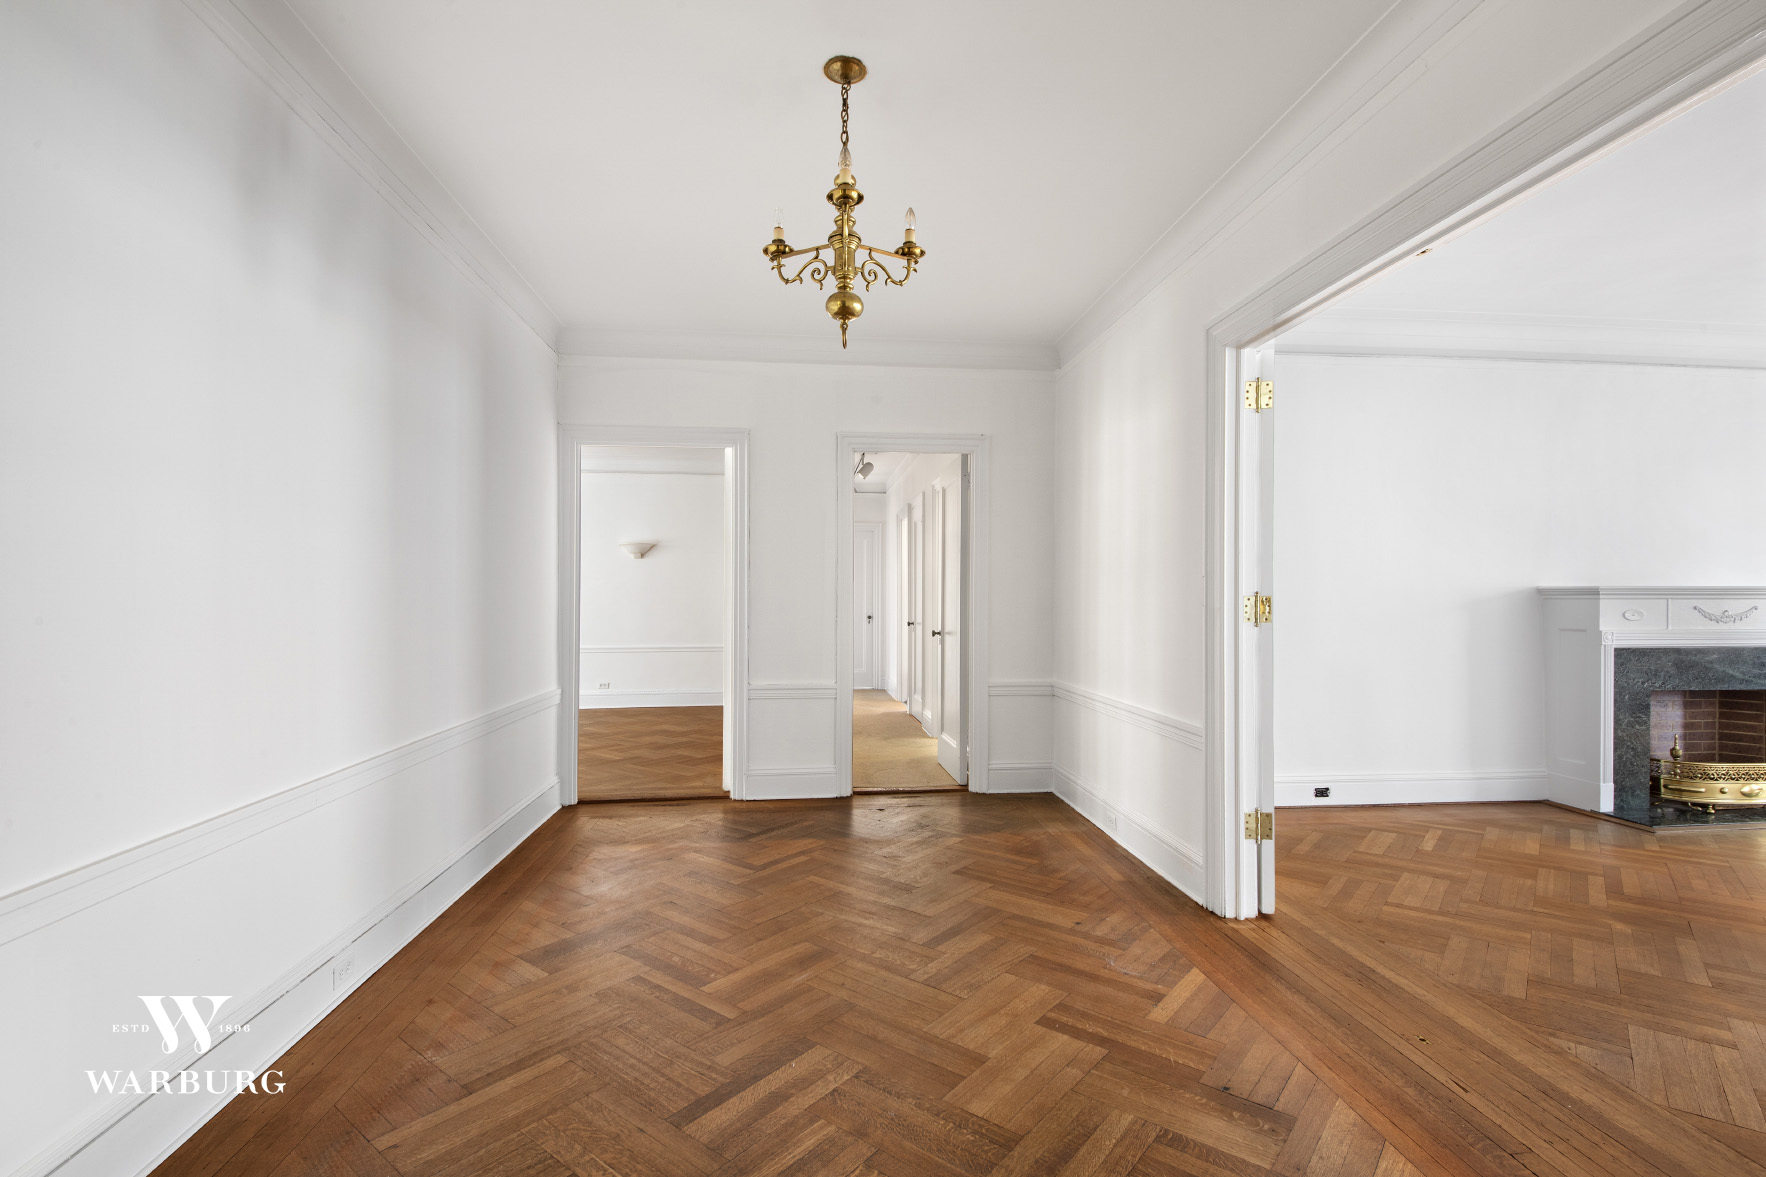 Apartment for sale at 262 Central Park West, Apt 9B